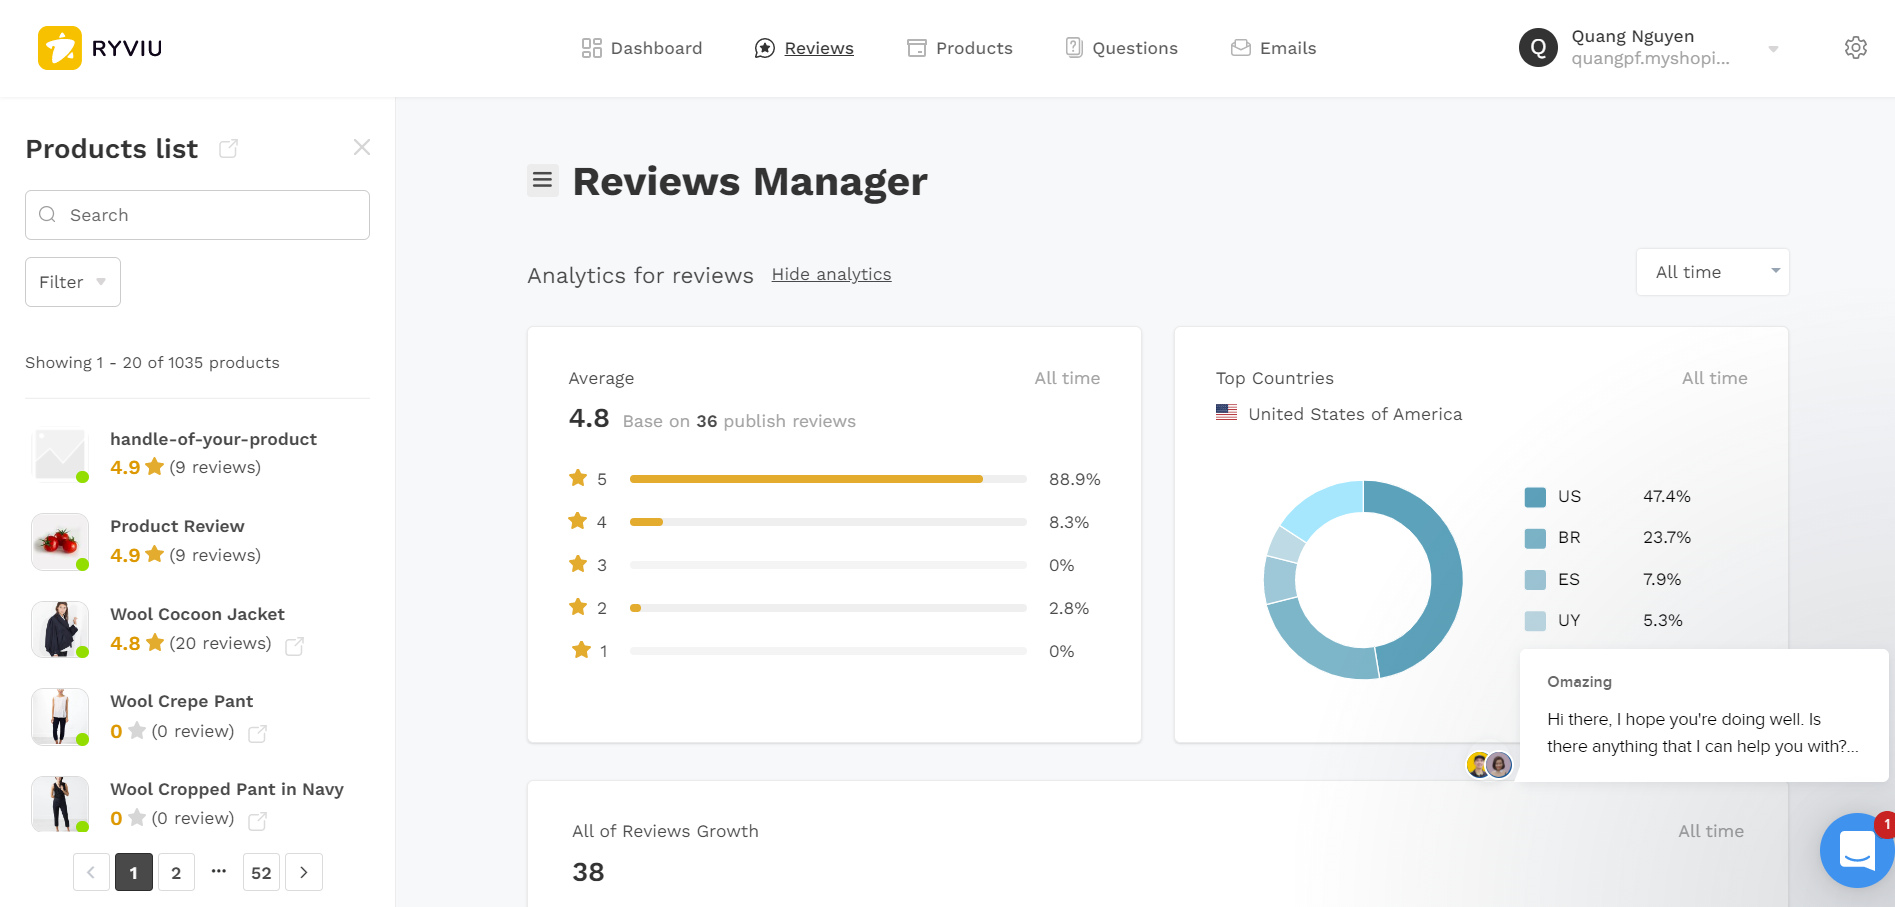 Ryviu Product Reviews App & QA element configuration